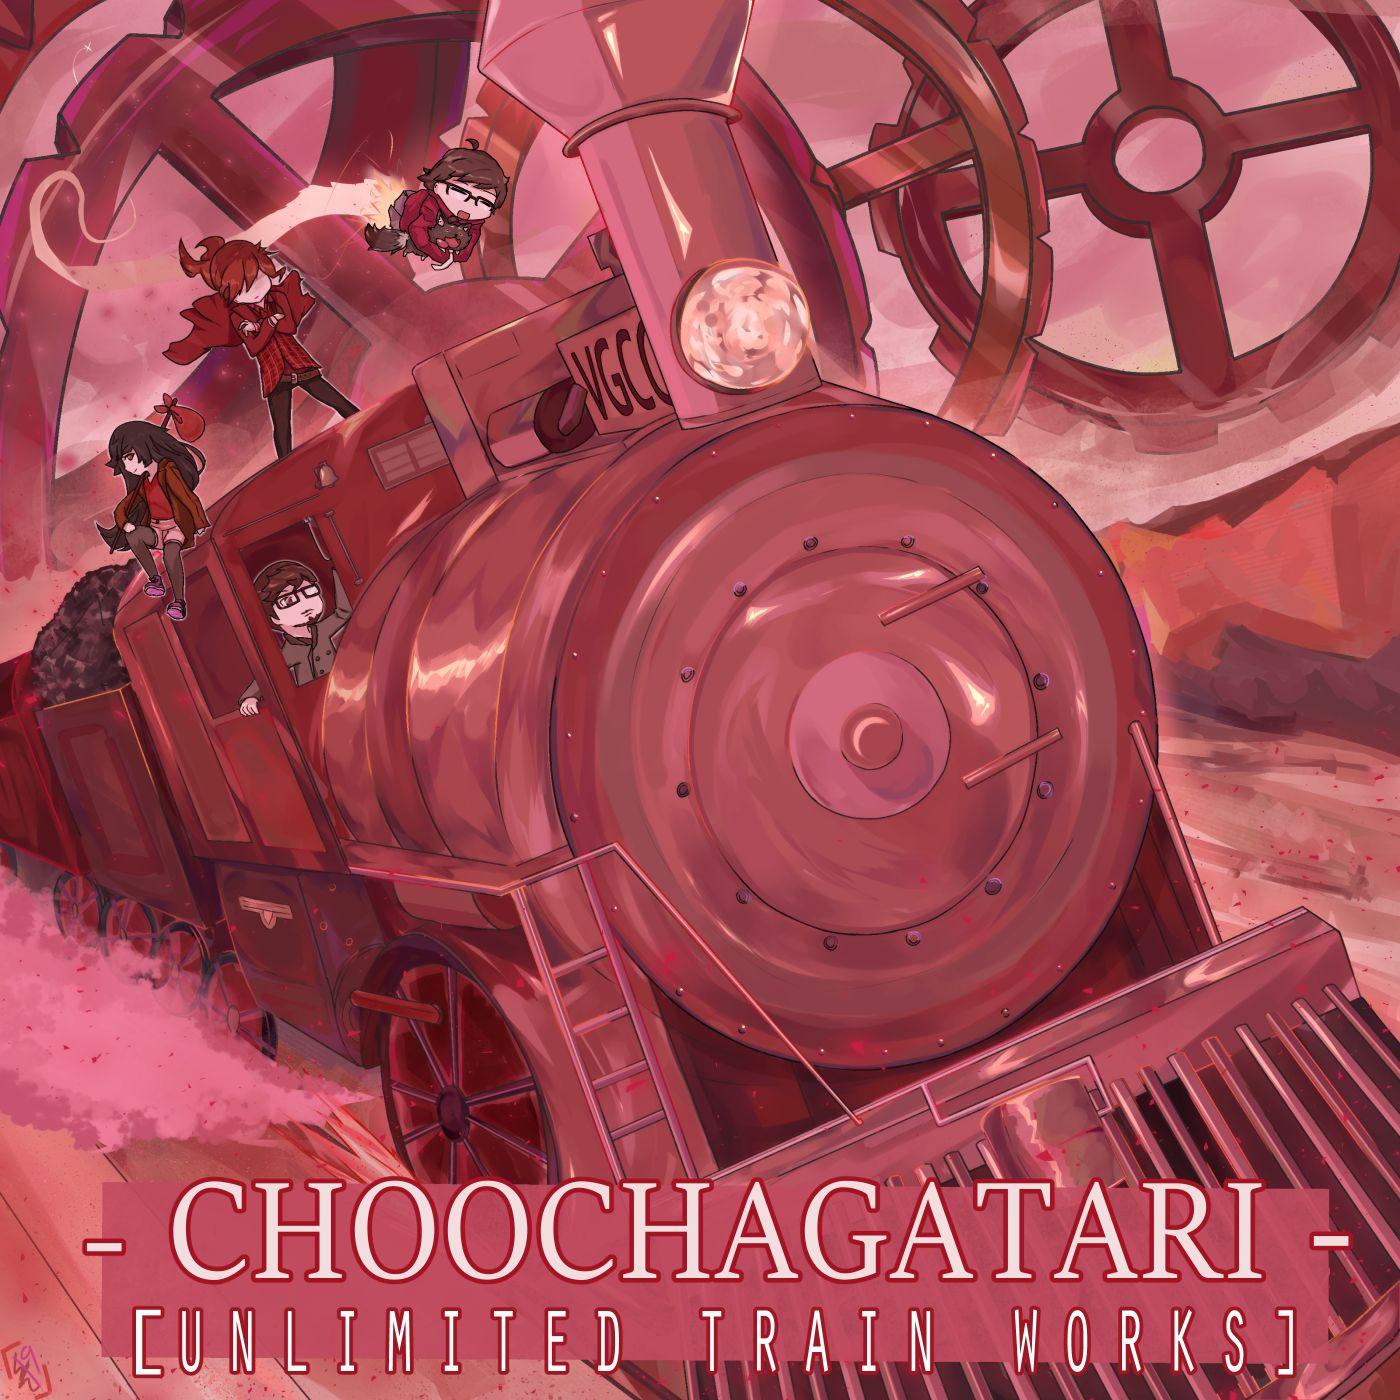 Choochagatari: Unlimited Train Works